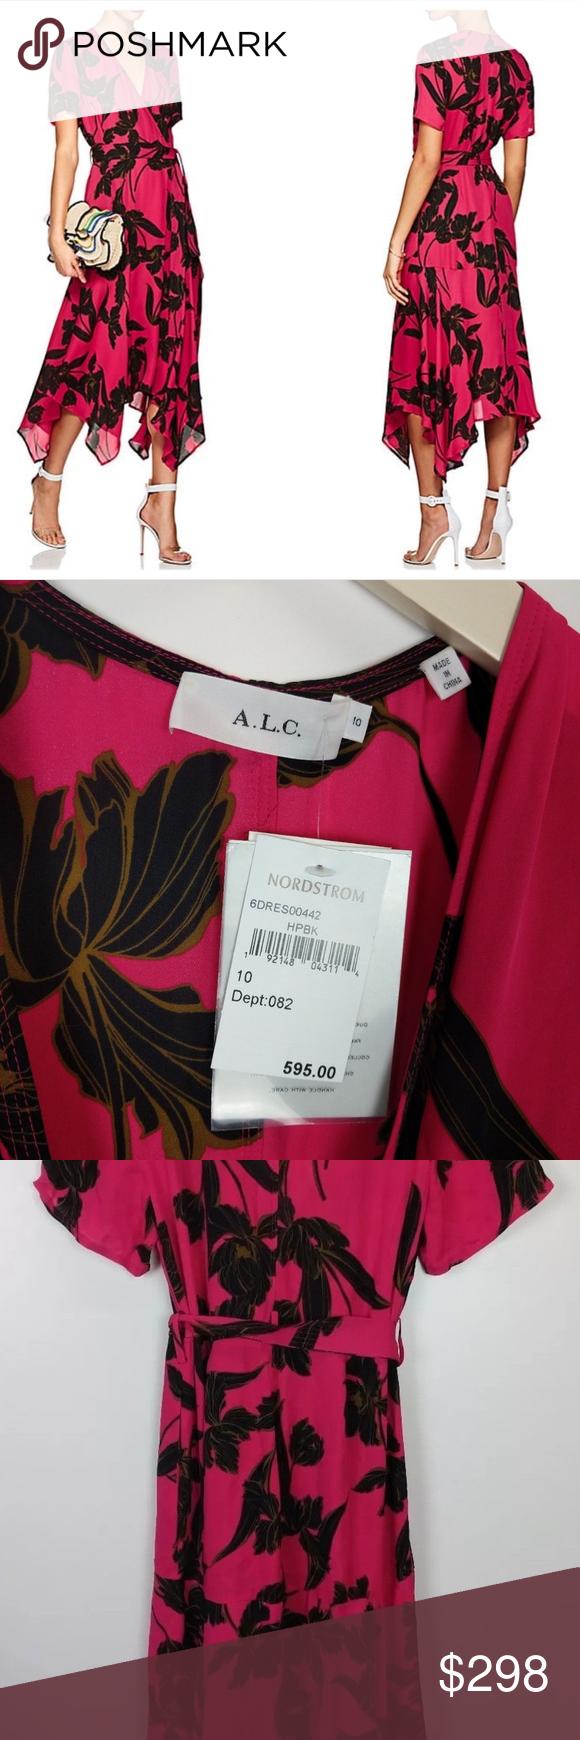 83a391dde946 A.L.C Cora Floral Print Silk Midi Wrap Dress A.L.C.